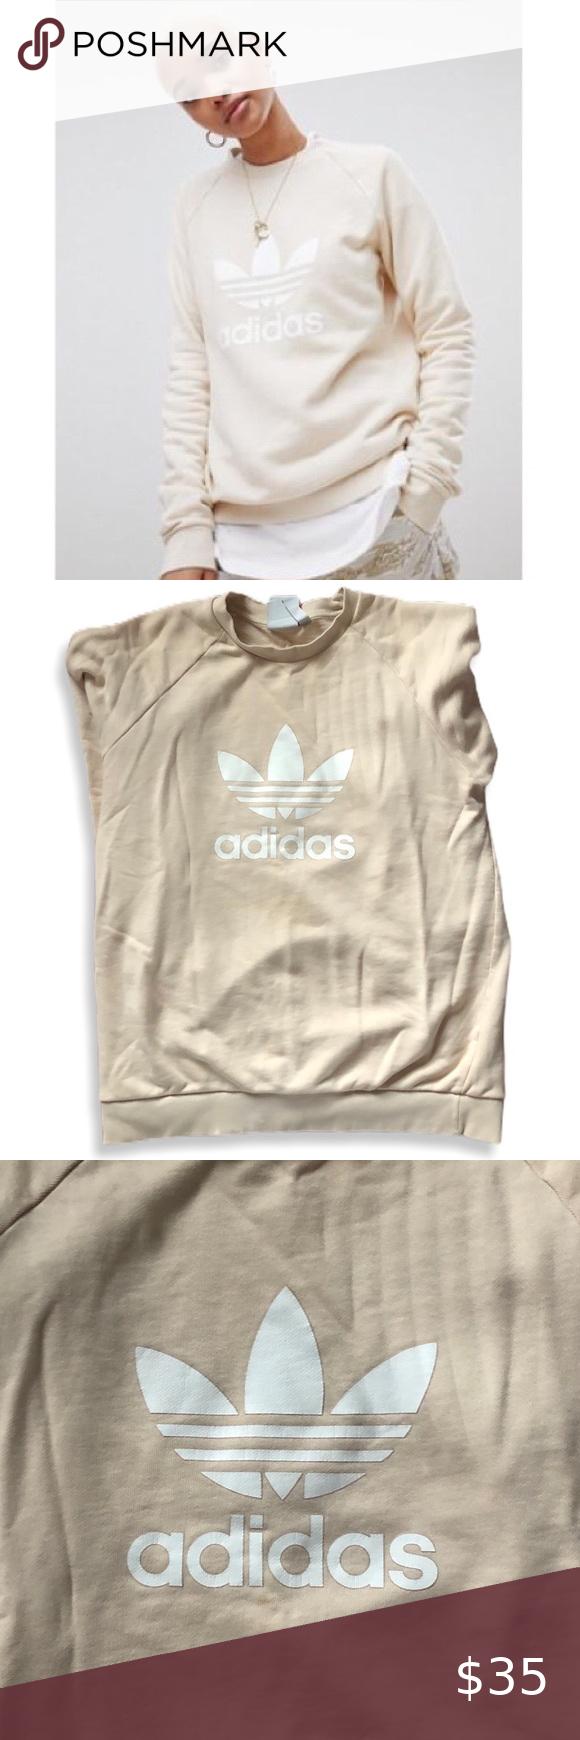 Adidas Cream Trefoil Oversized Sweatshirt Oversized Sweatshirt Sweatshirts Adidas Tops [ 1740 x 580 Pixel ]